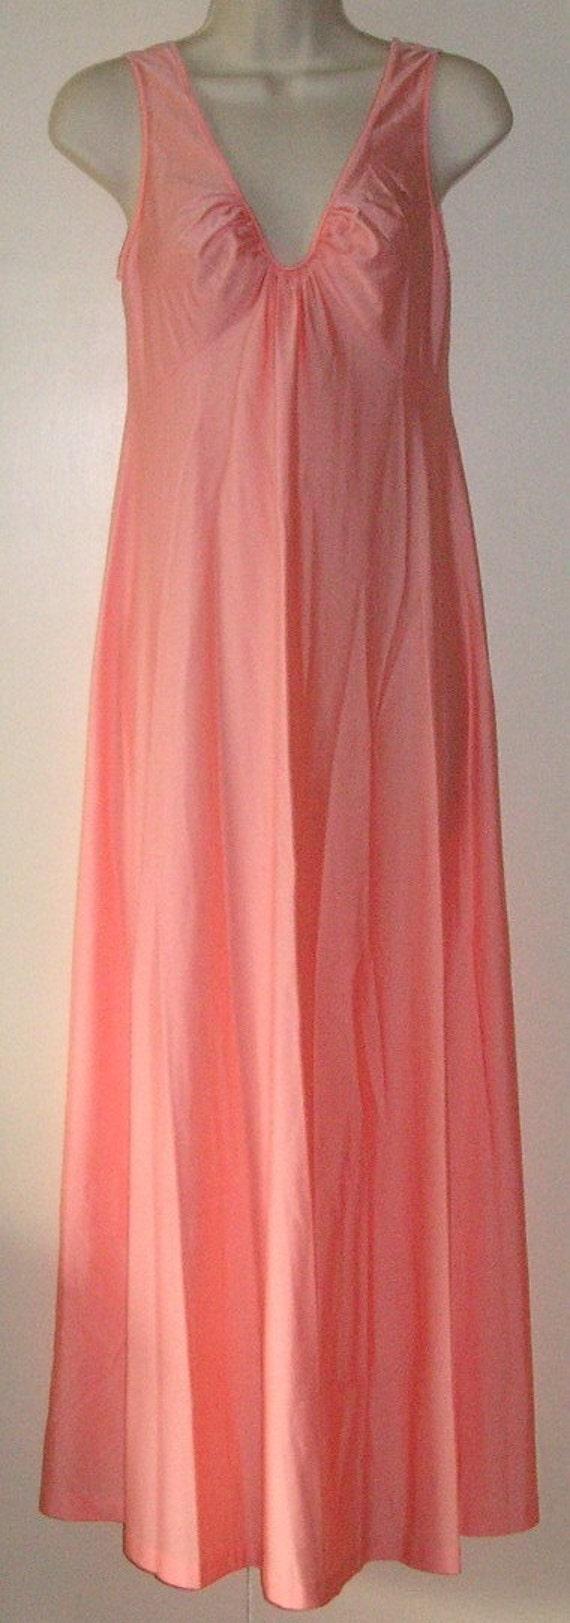 SHADOWLINE petite peach coral long nightgown Petite all nylon